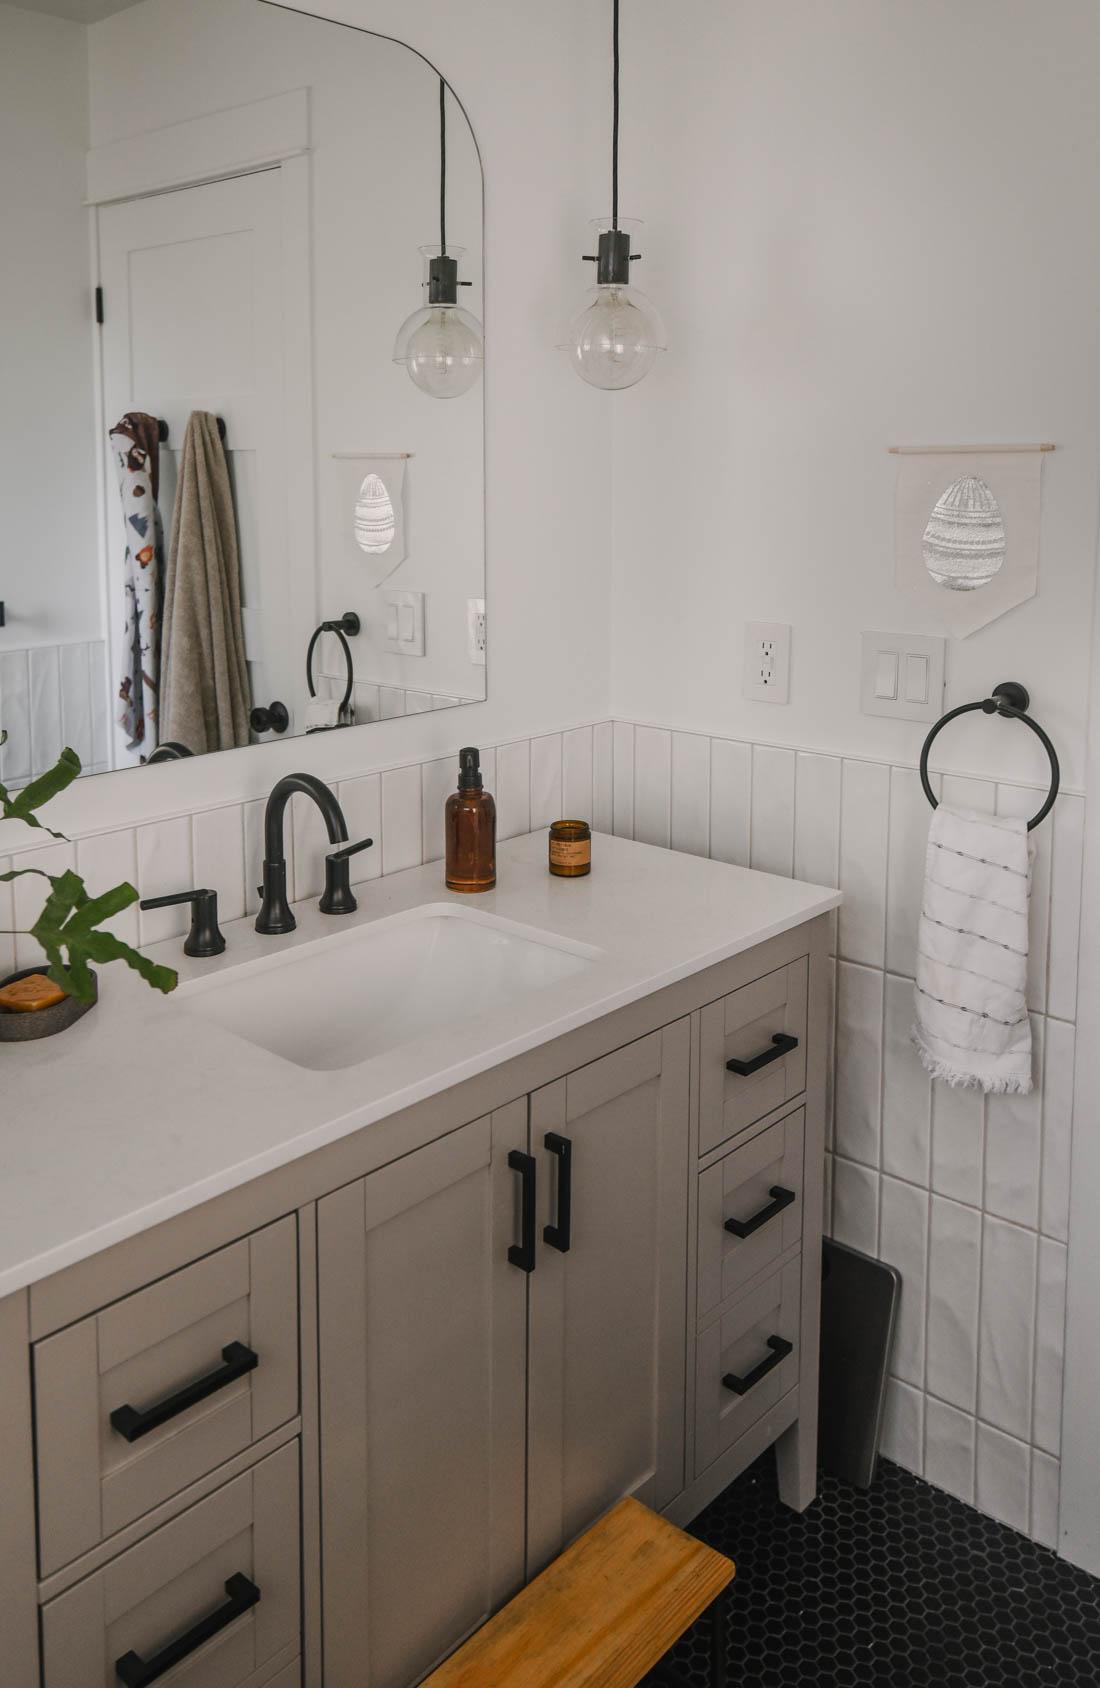 Modern Minimal Bathroom Decor